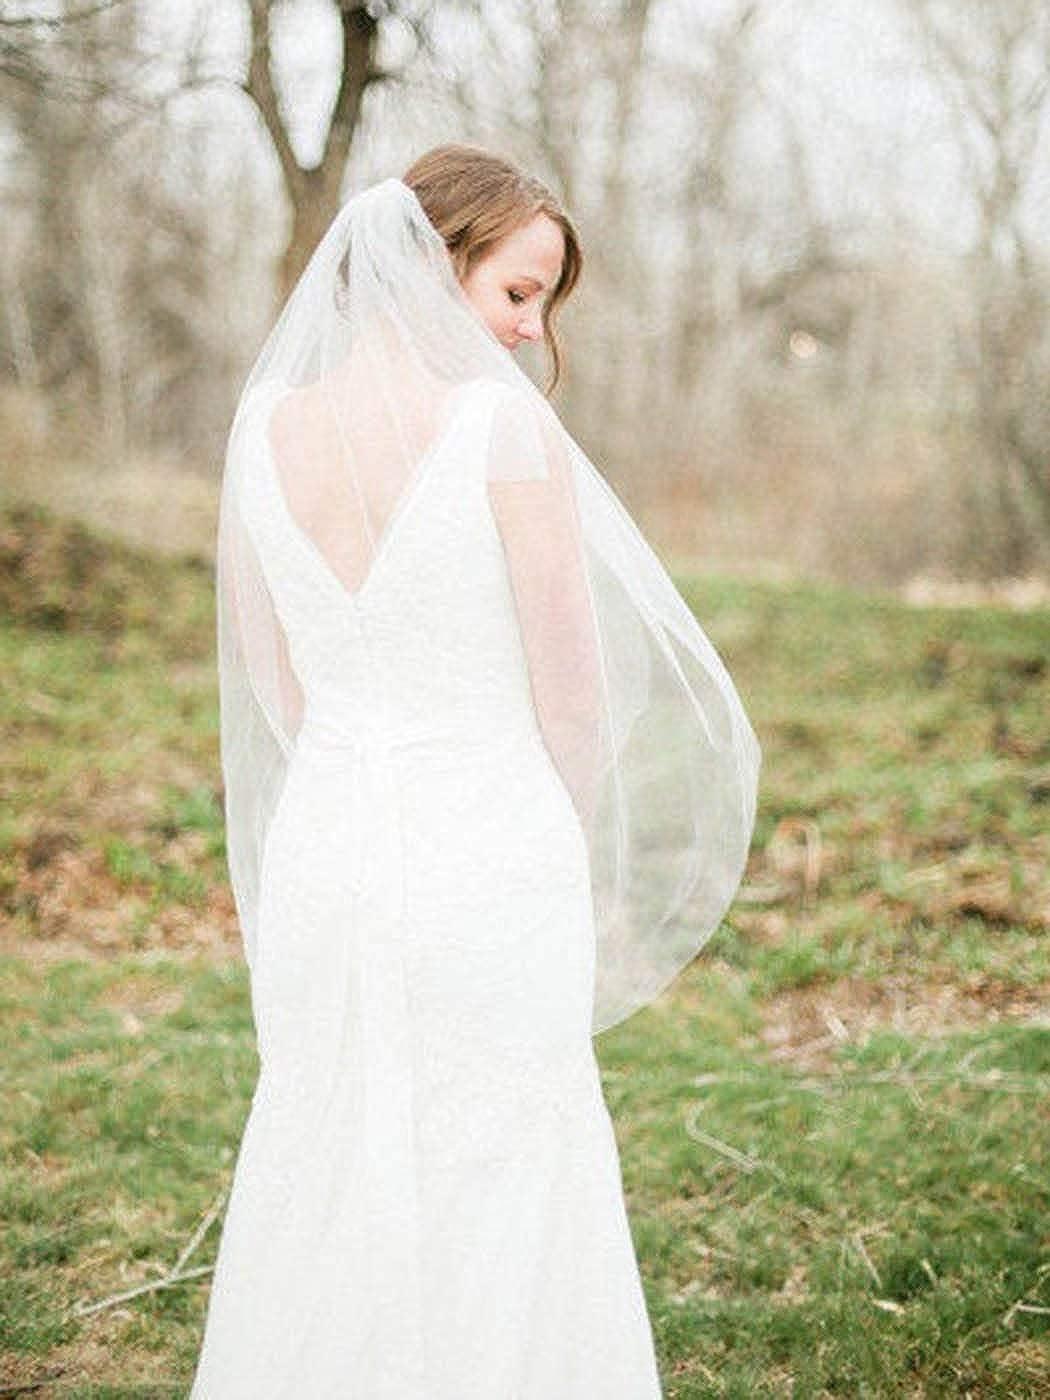 Milanco Wedding Bridal Veil with Comb White Cut Edge Drop Veil 2 Tier Brides Hair Accessories for Women Elbow Length